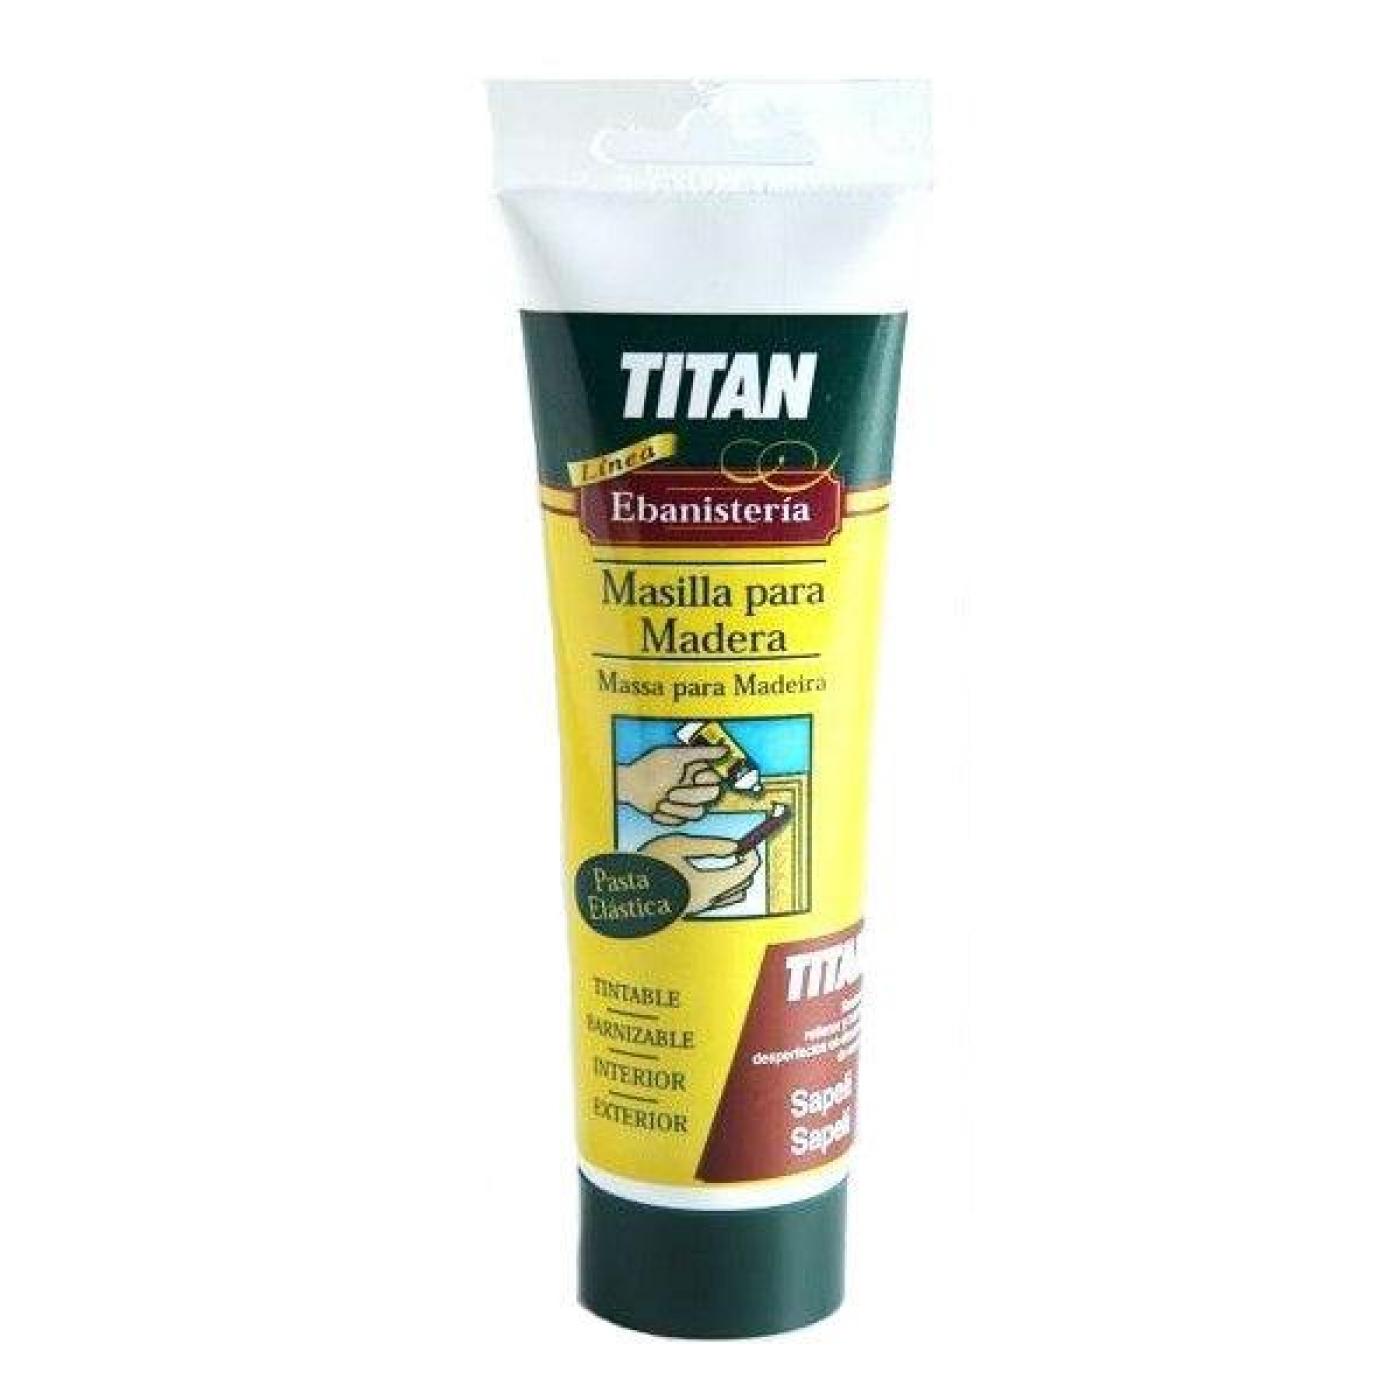 Masilla para madera roble titanlux 125 ml por 3 50 en - Masilla para madera casera ...